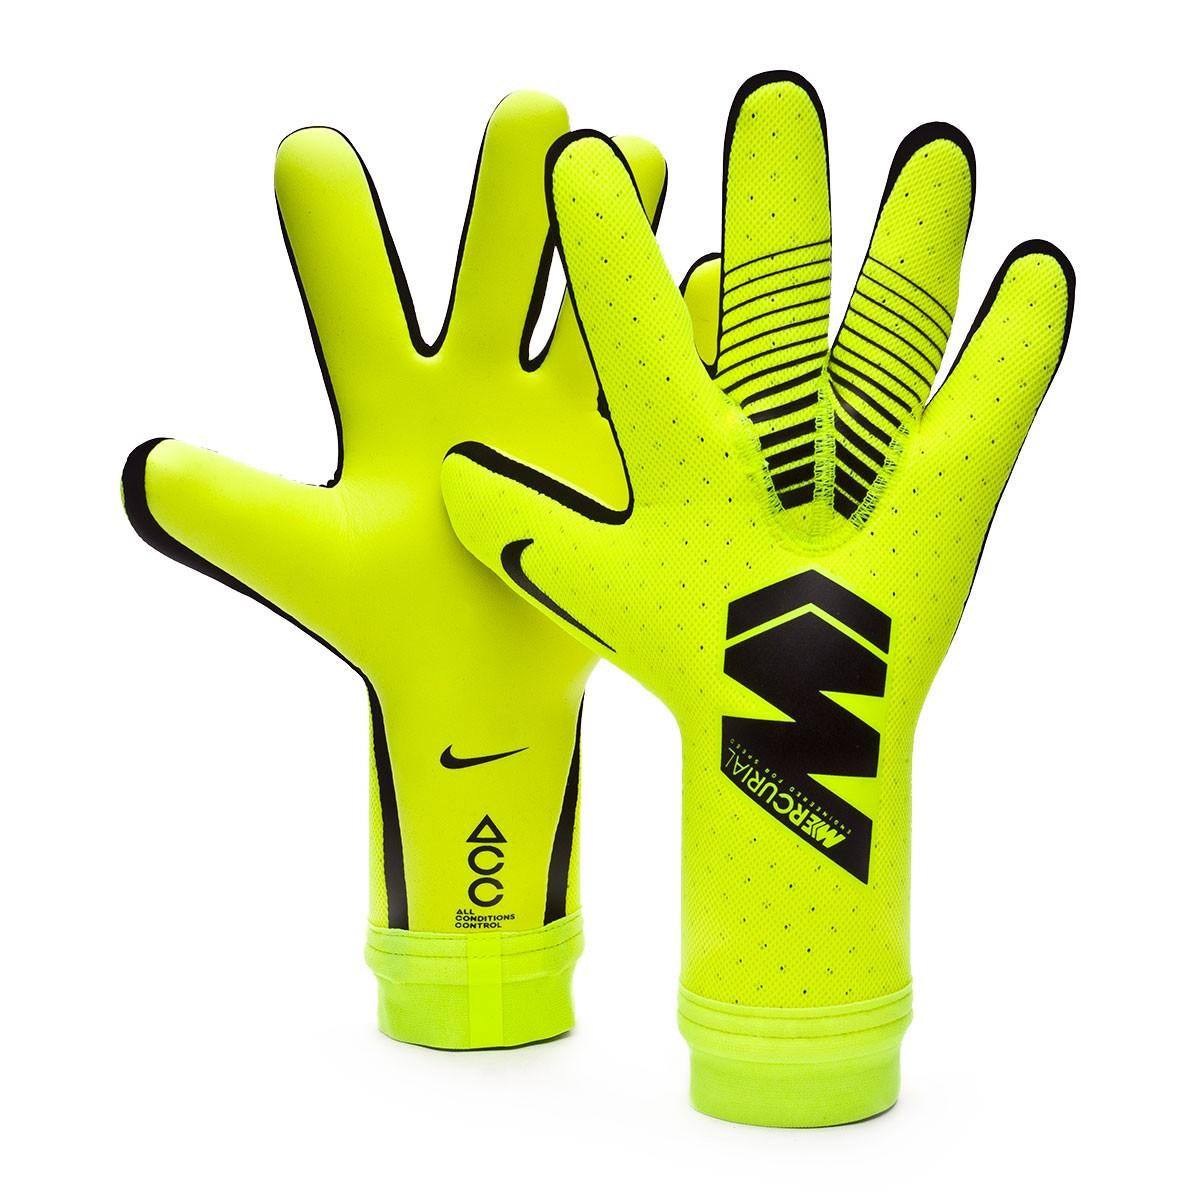 Luvas Nike Mercurial Touch Elite Volt-Black - Loja de ...